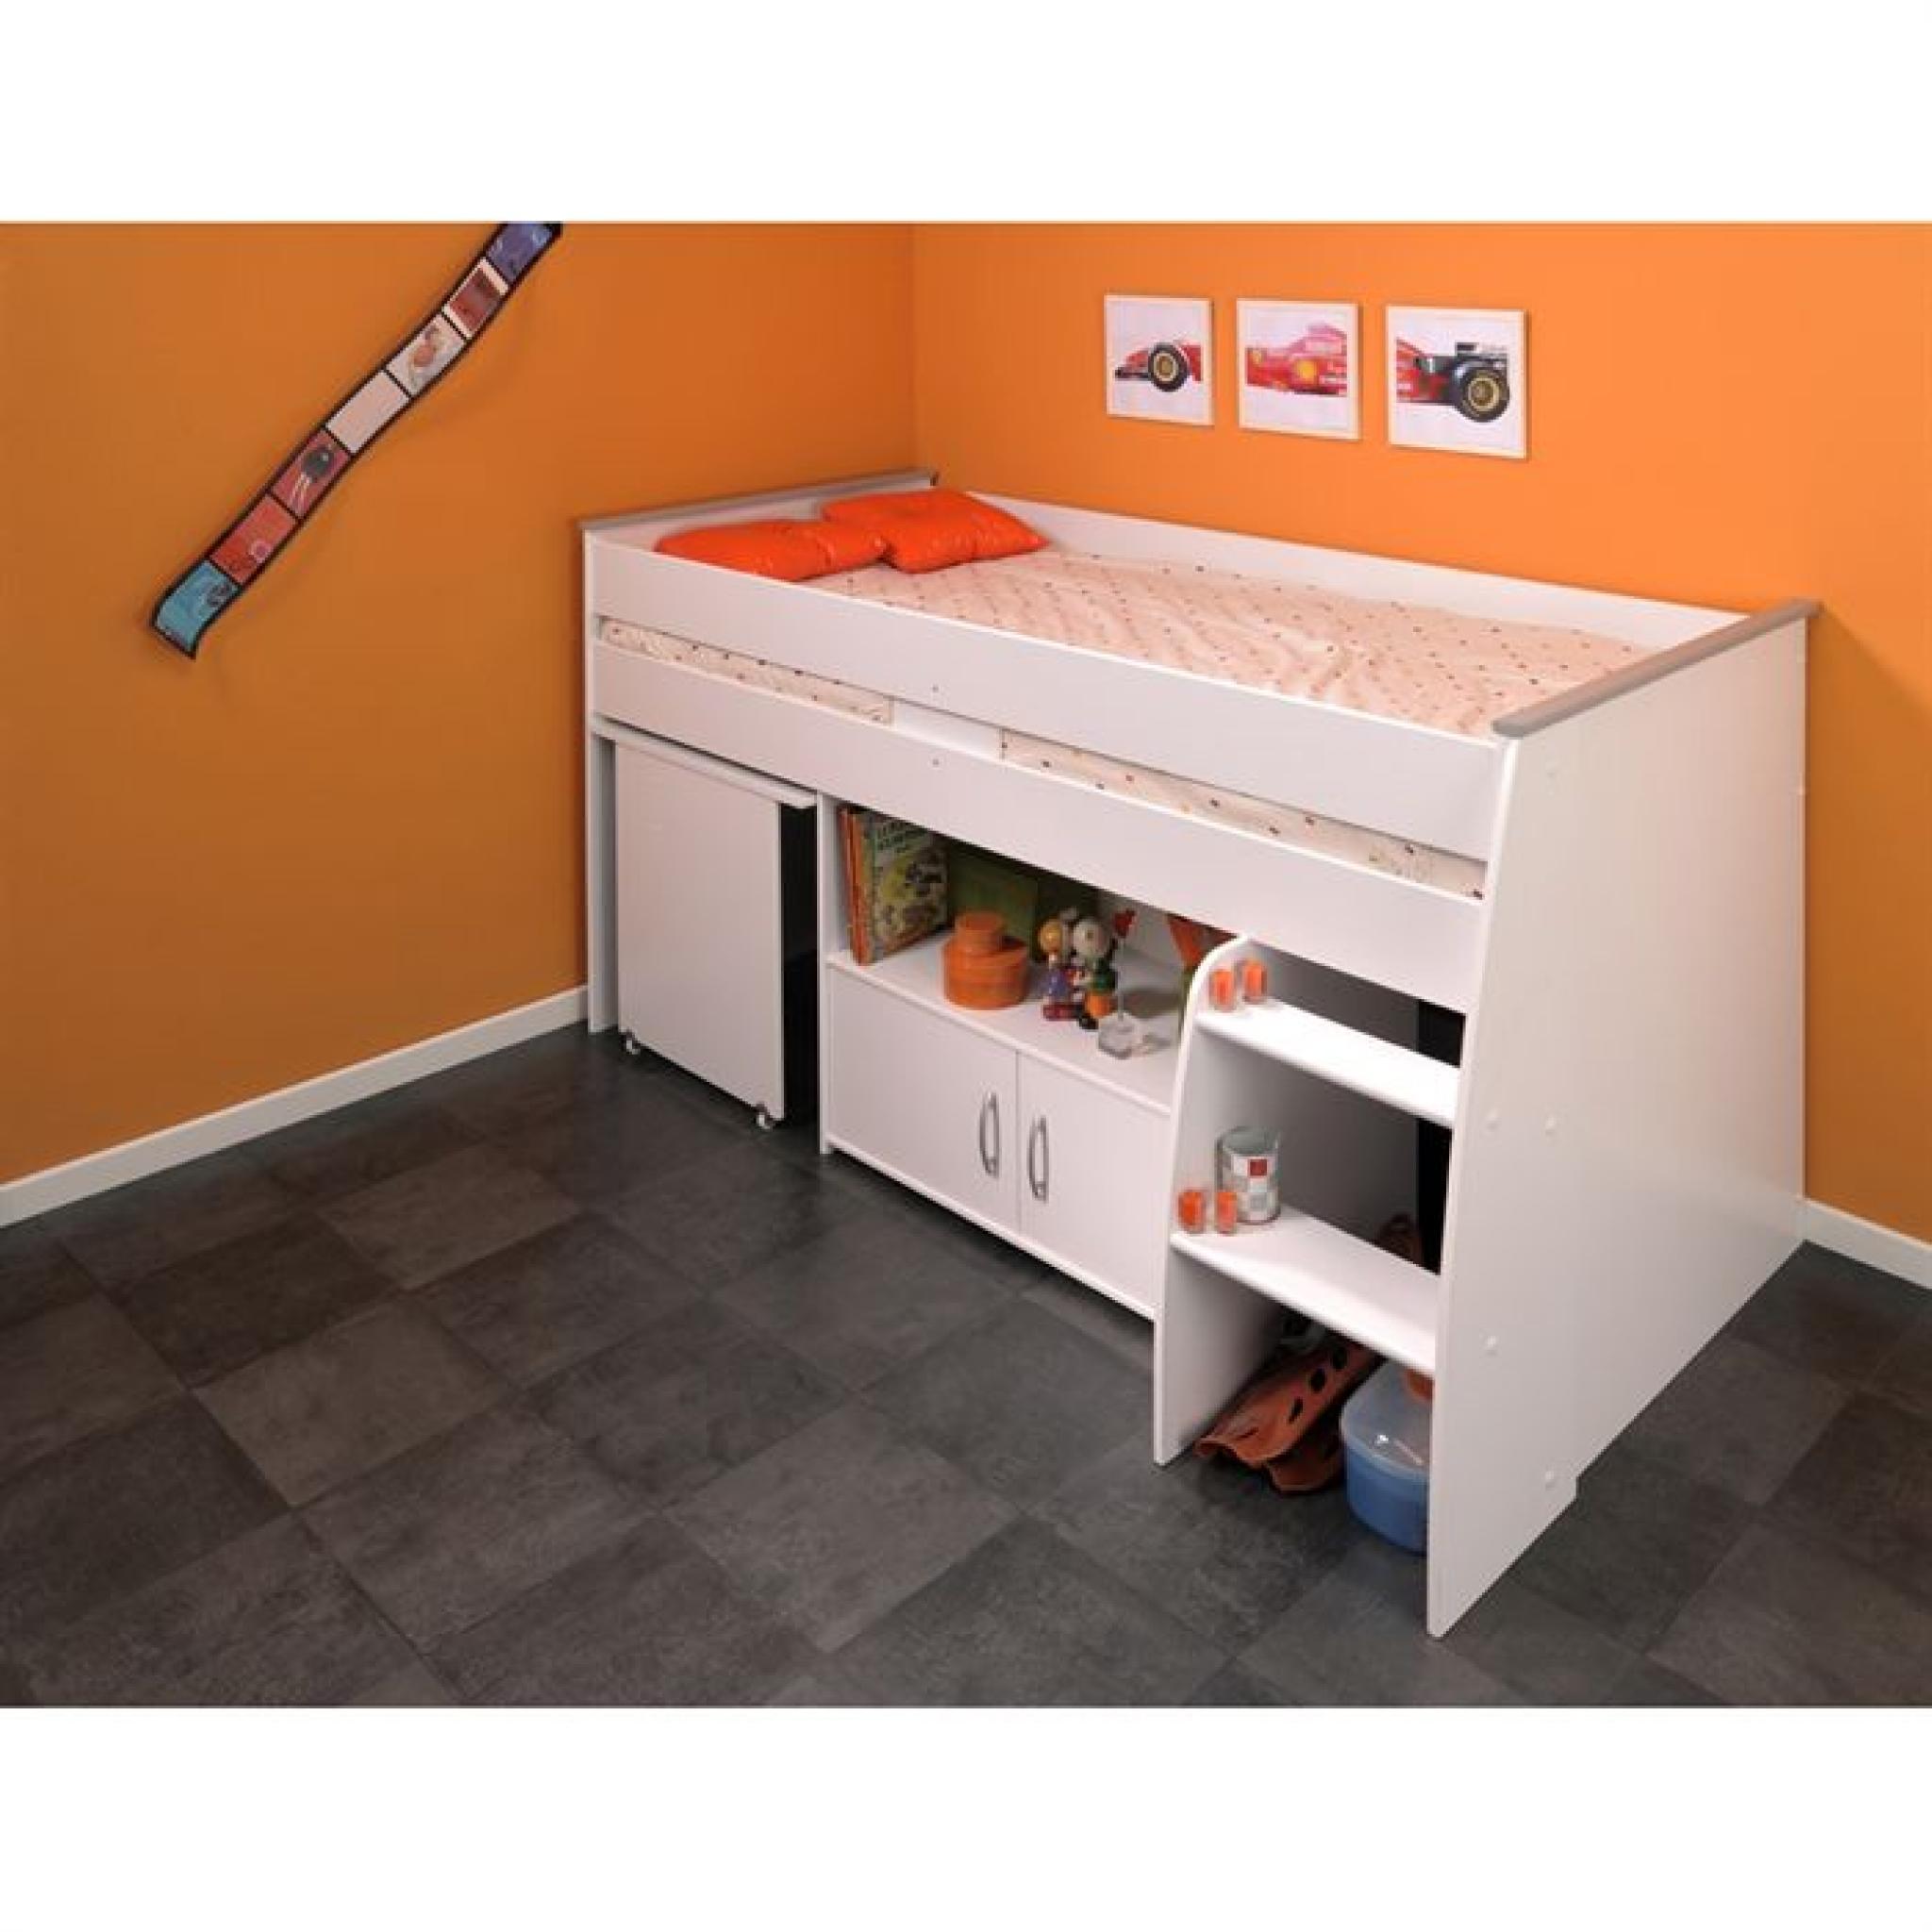 zola lit enfant combin 90x200 achat vente lit superpose. Black Bedroom Furniture Sets. Home Design Ideas